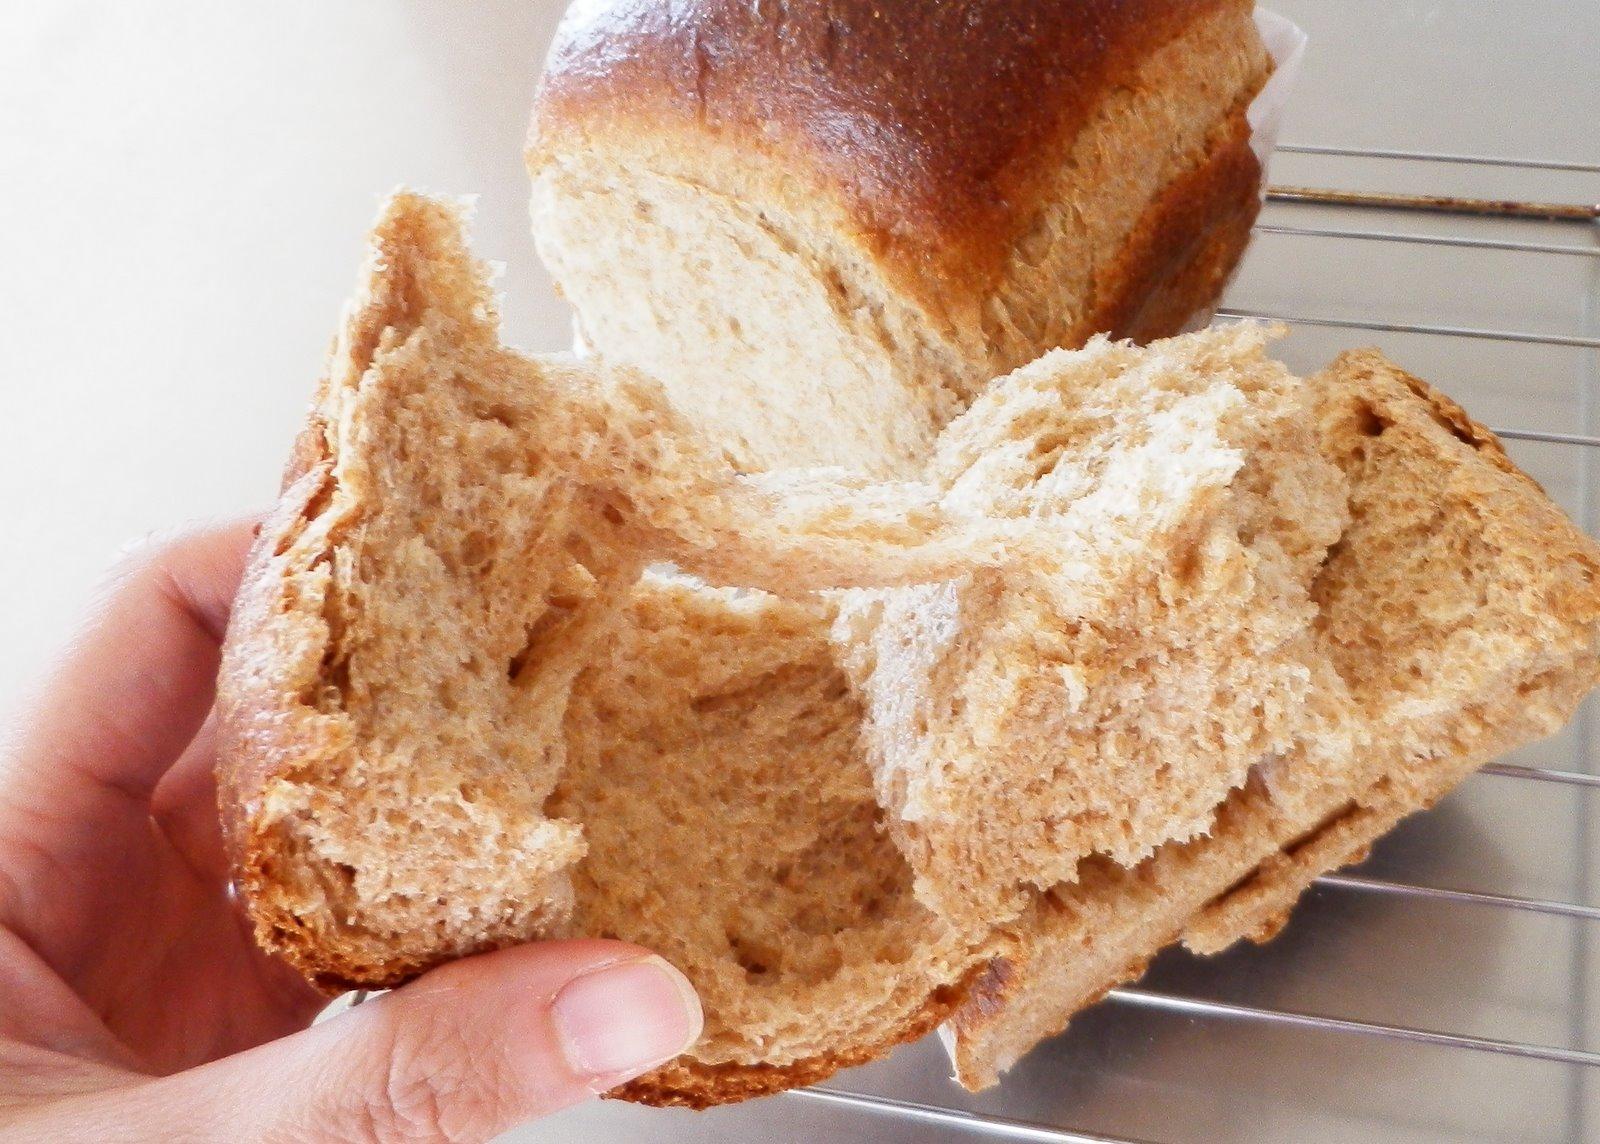 hokkaido milk bread hokkaido milk toast01 hokkaido milk loaf is a soft ...